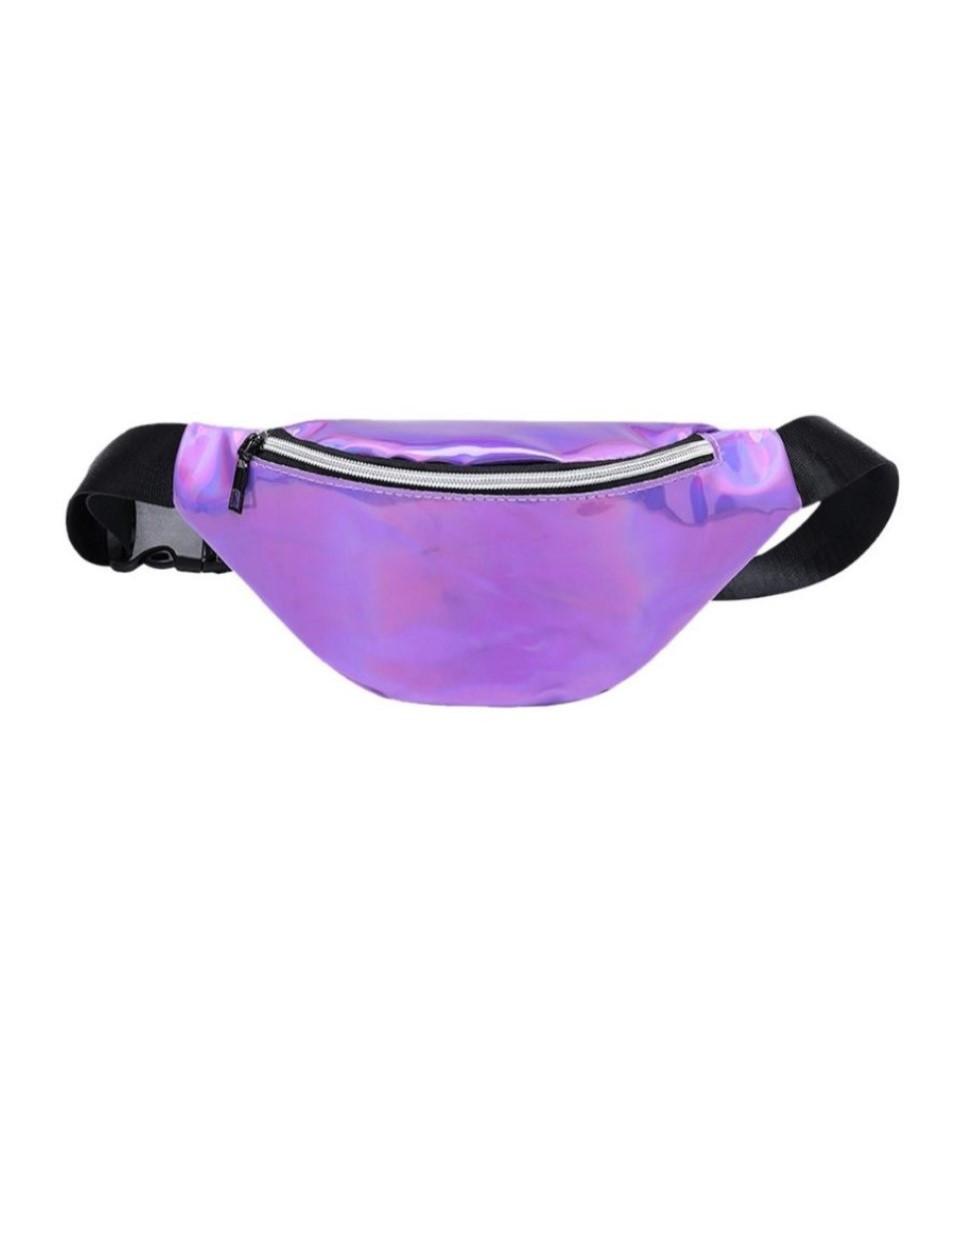 Блестящая женская сумка бананка Голограмма 5, Фиолетовая